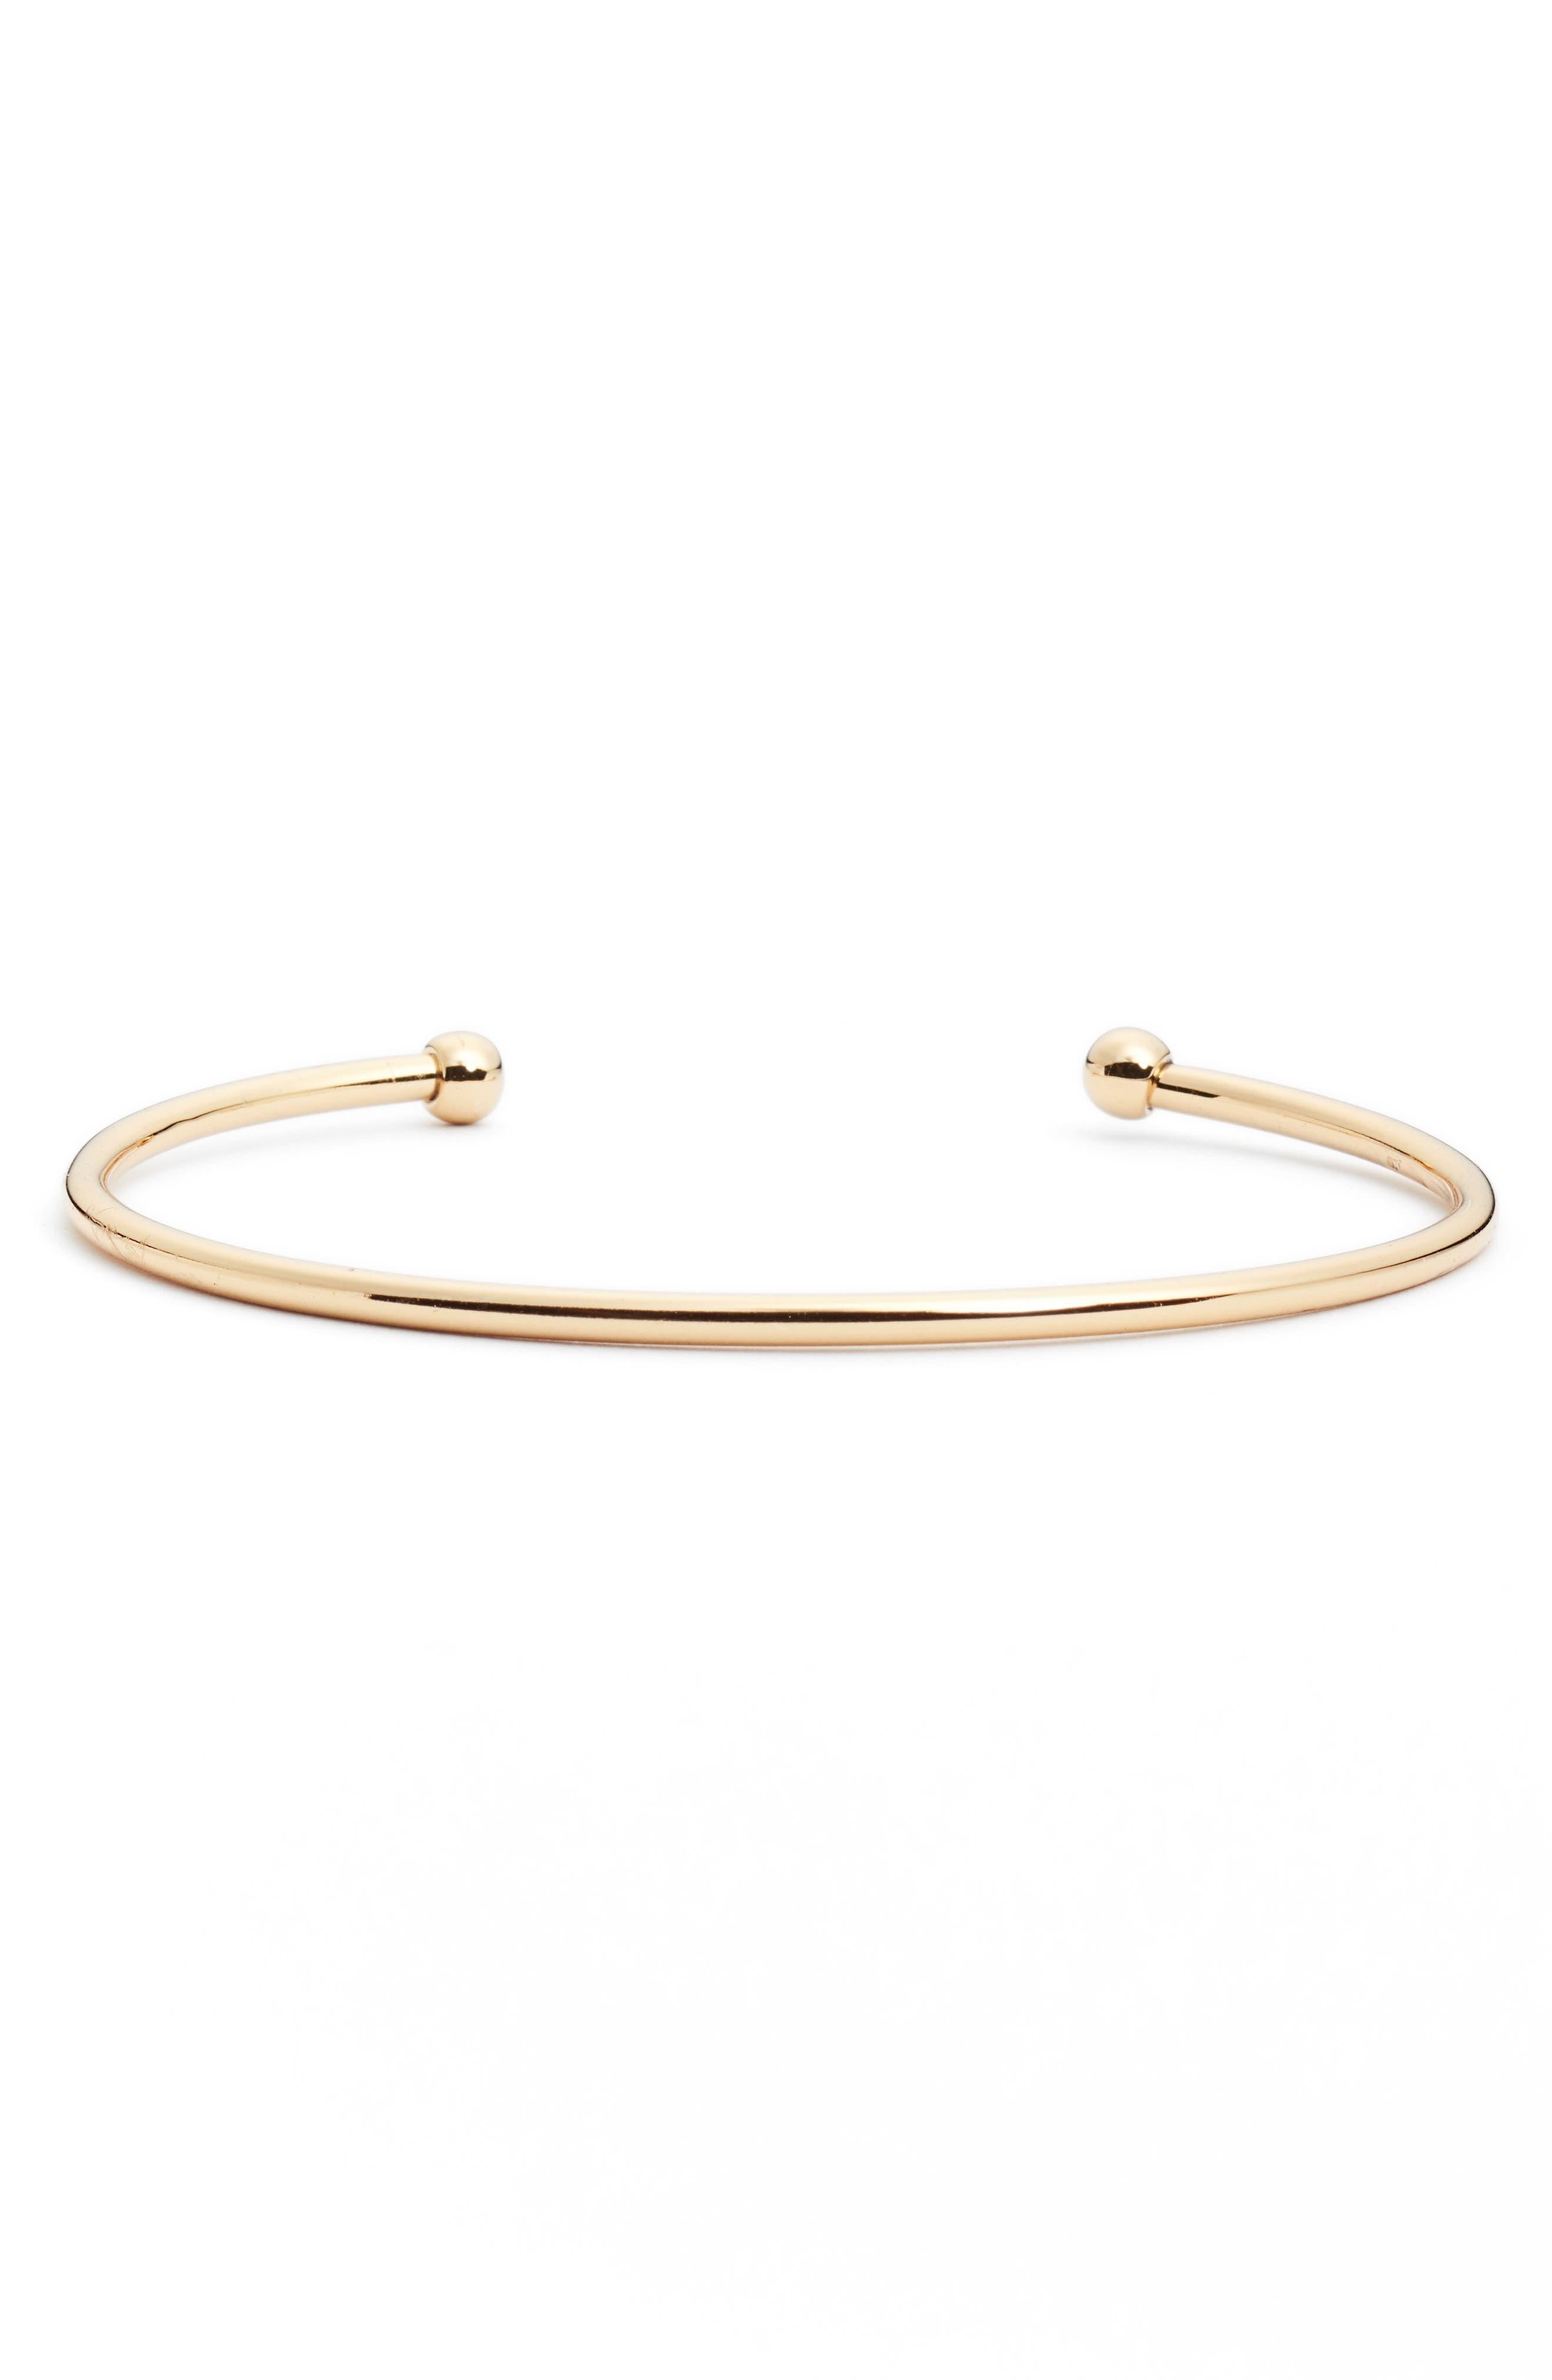 Break Free Bracelet,                         Main,                         color, GOLD